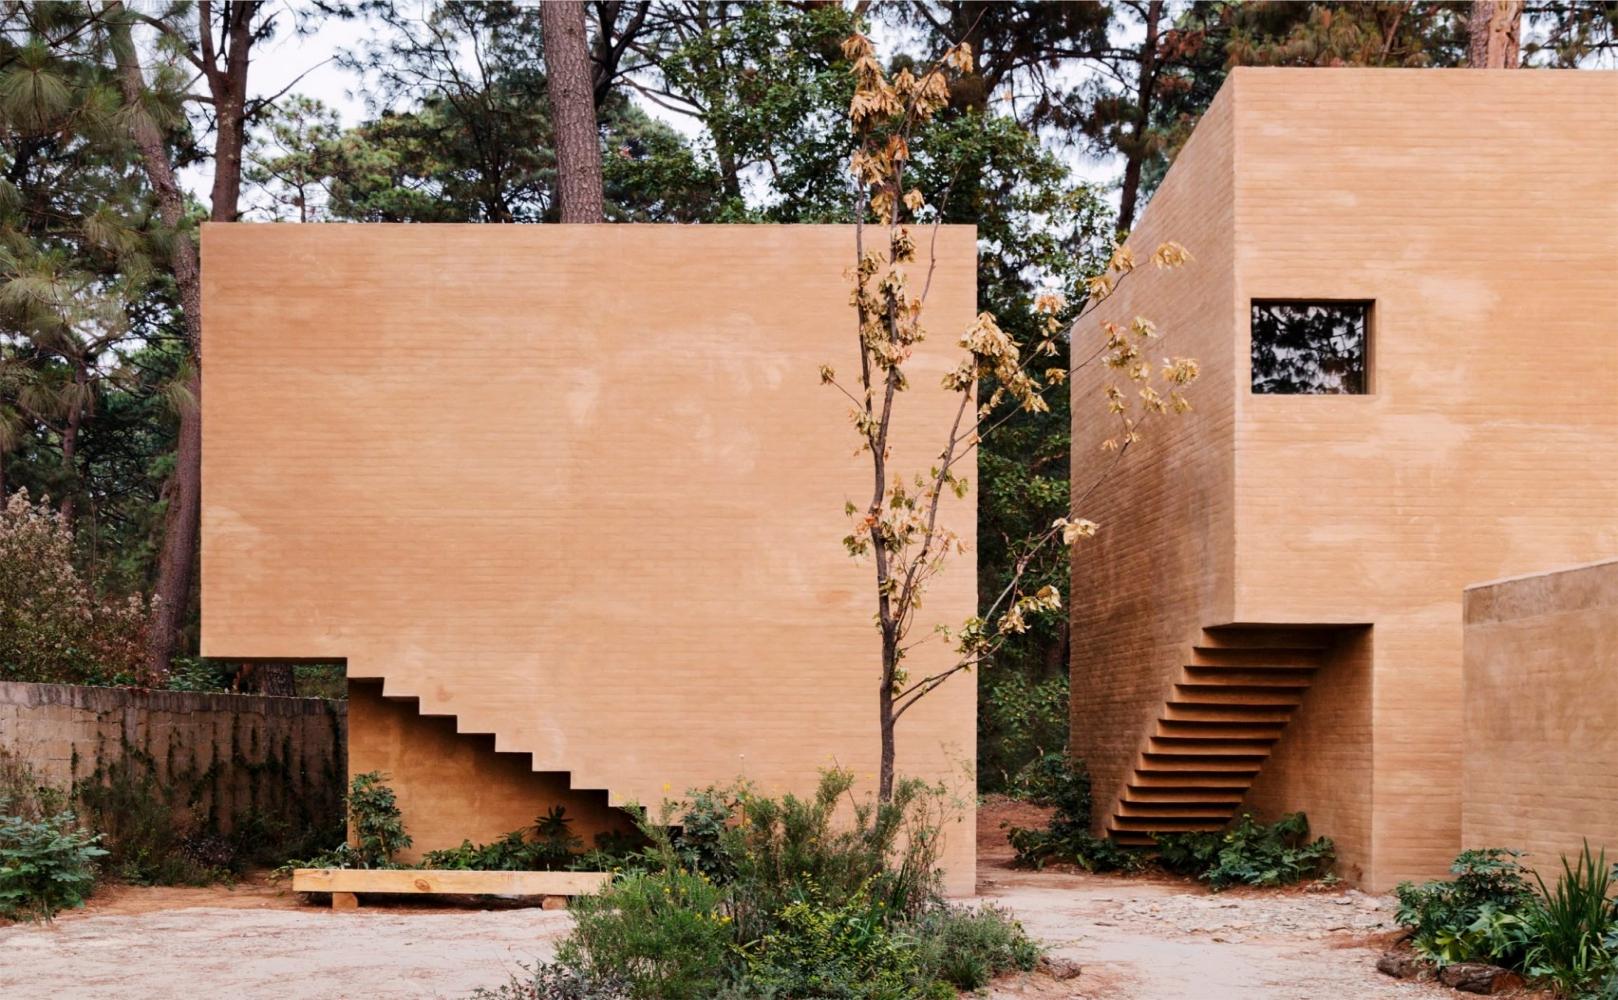 entre-pinos-house-by-taller-hector-barroso_dezeen_2364_col_2-1704x1278